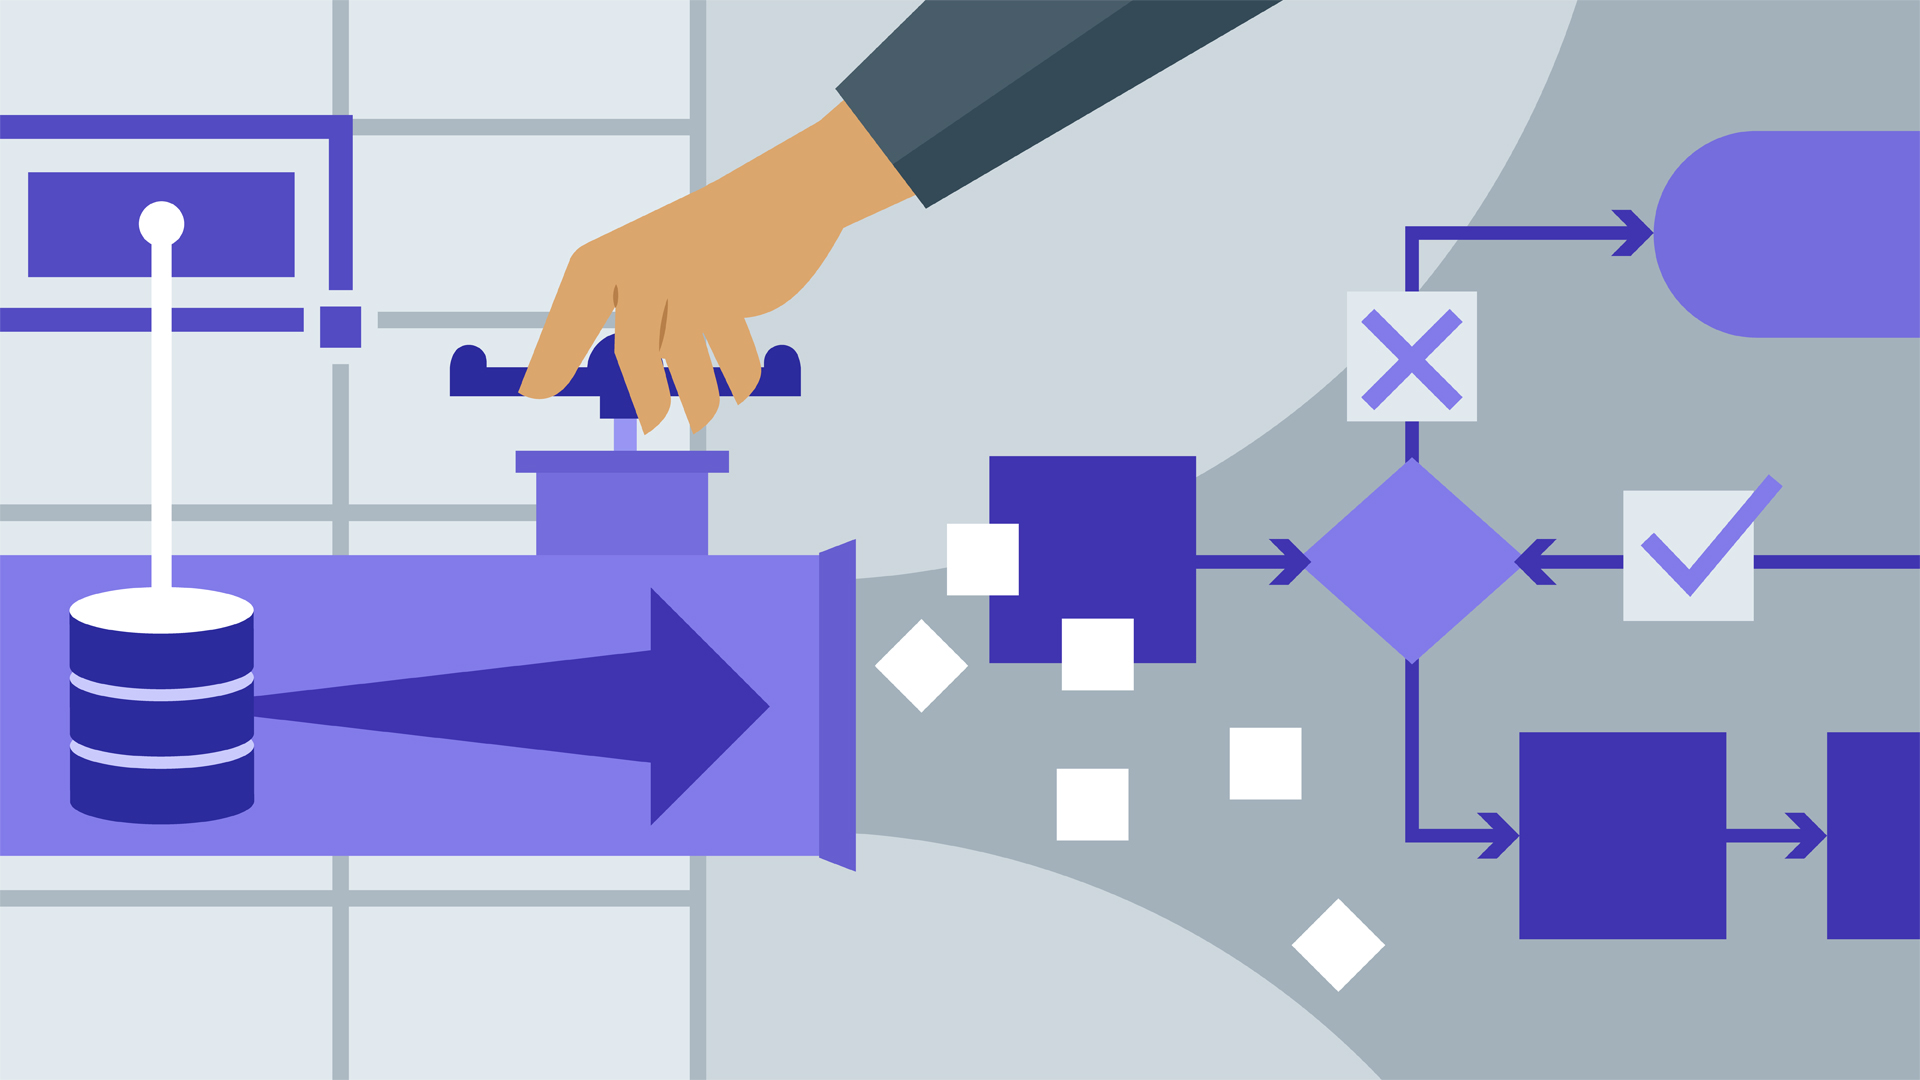 process flow diagram in visio excel and visio generating diagrams automatically  excel and visio generating diagrams